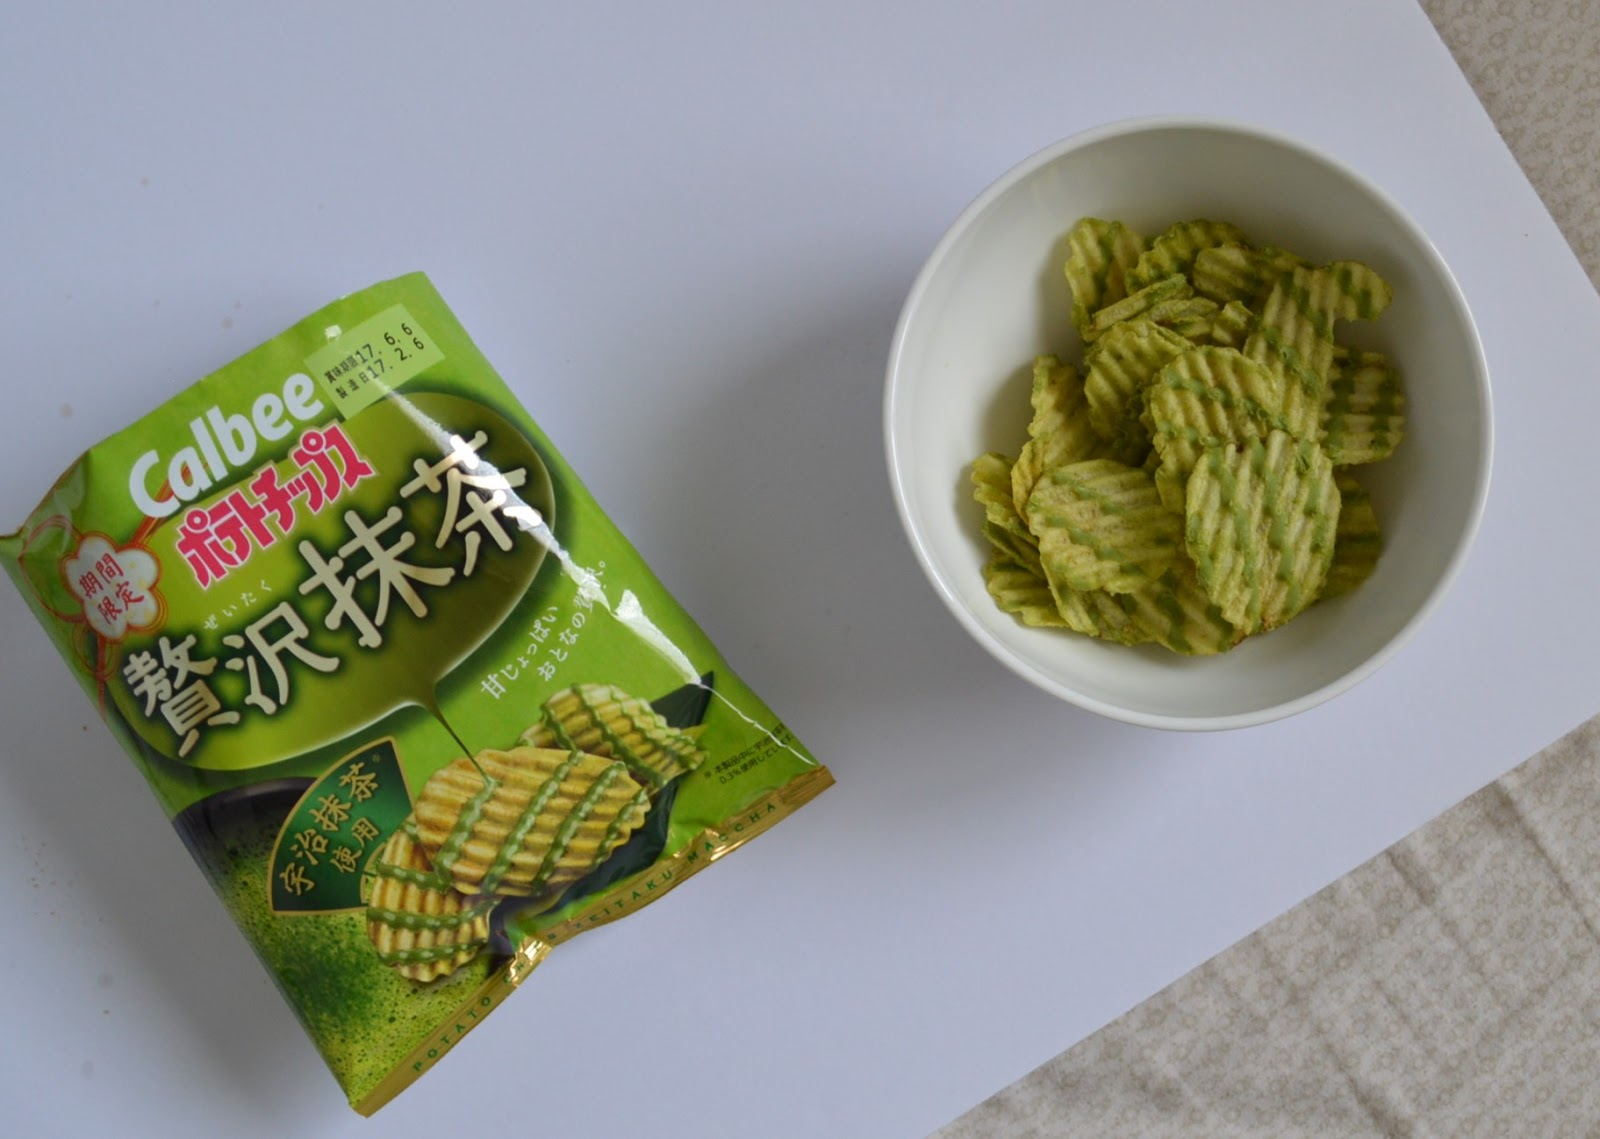 Hasil gambar untuk calbee potato chips matcha